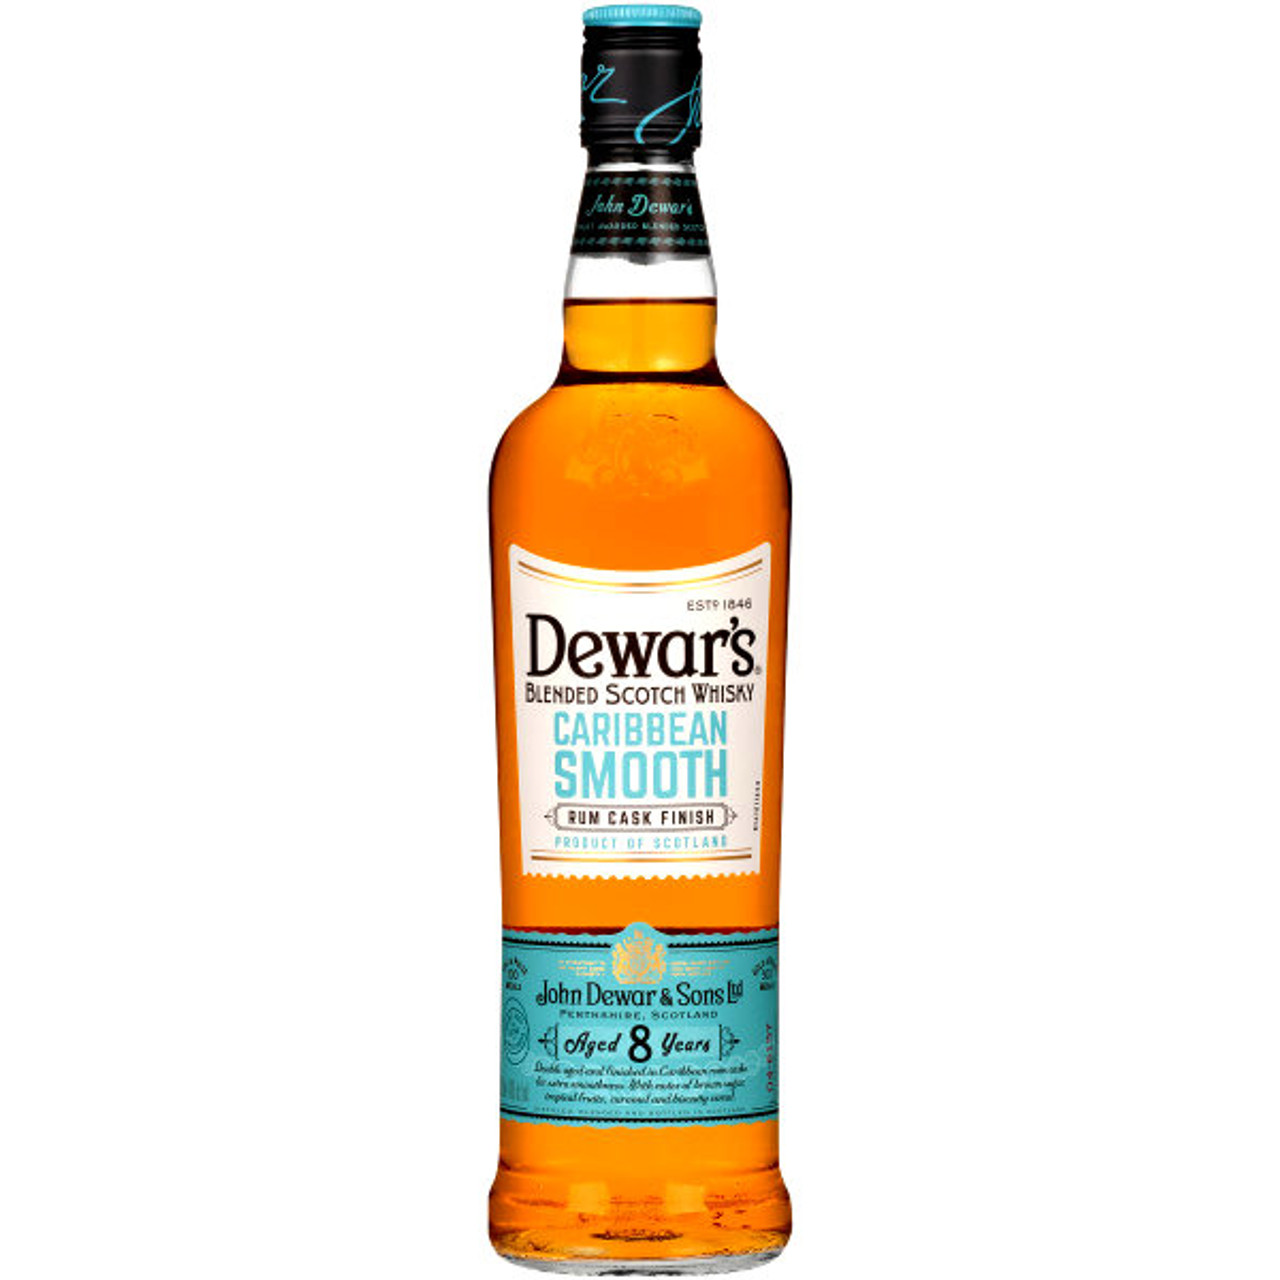 Dewar's Caribbean Smooth Blended Scotch Whisky 750ml